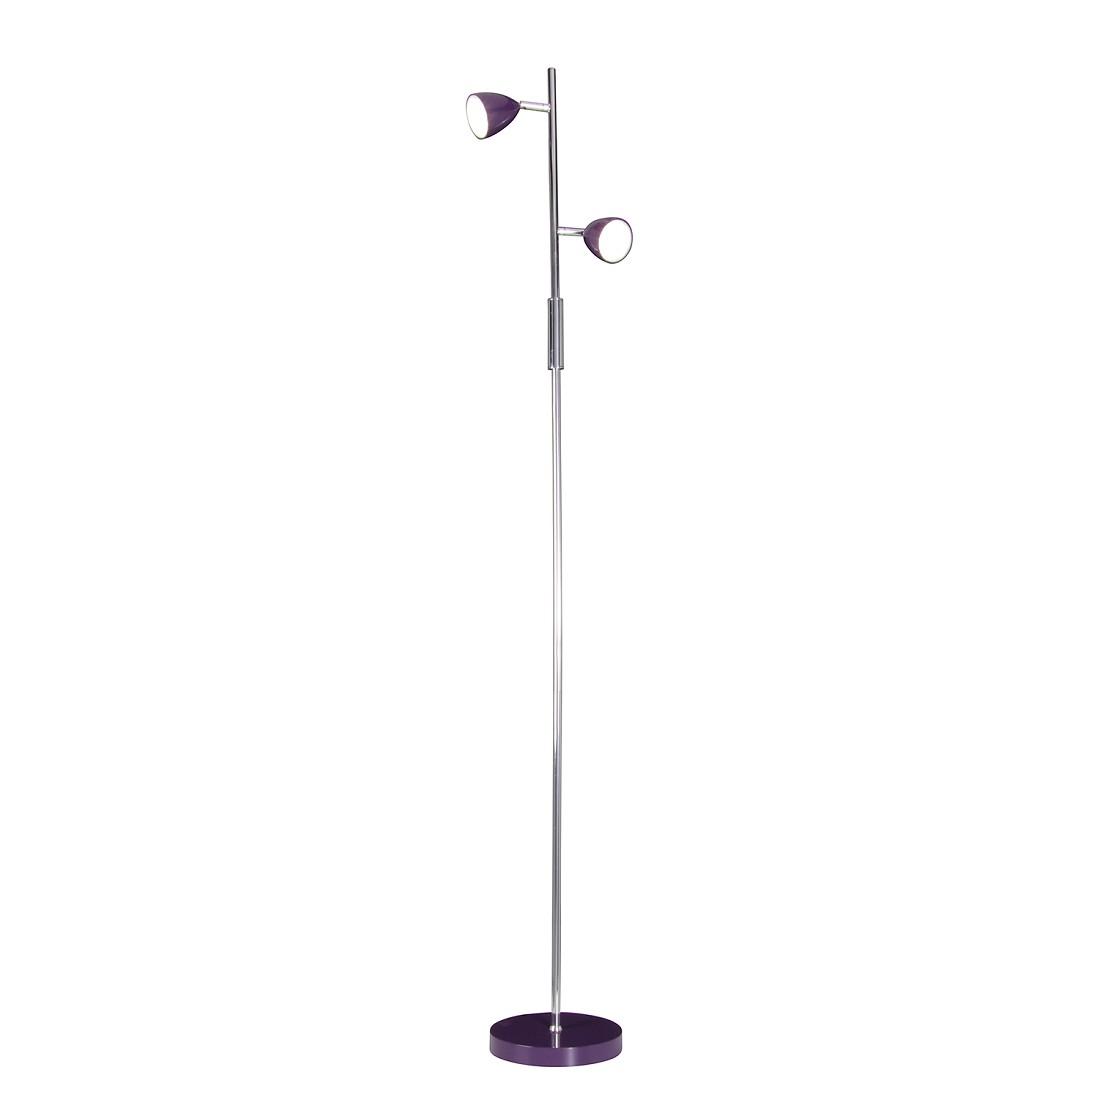 LED Stehleuchte Oskar ● Metall ● Violett- Näve